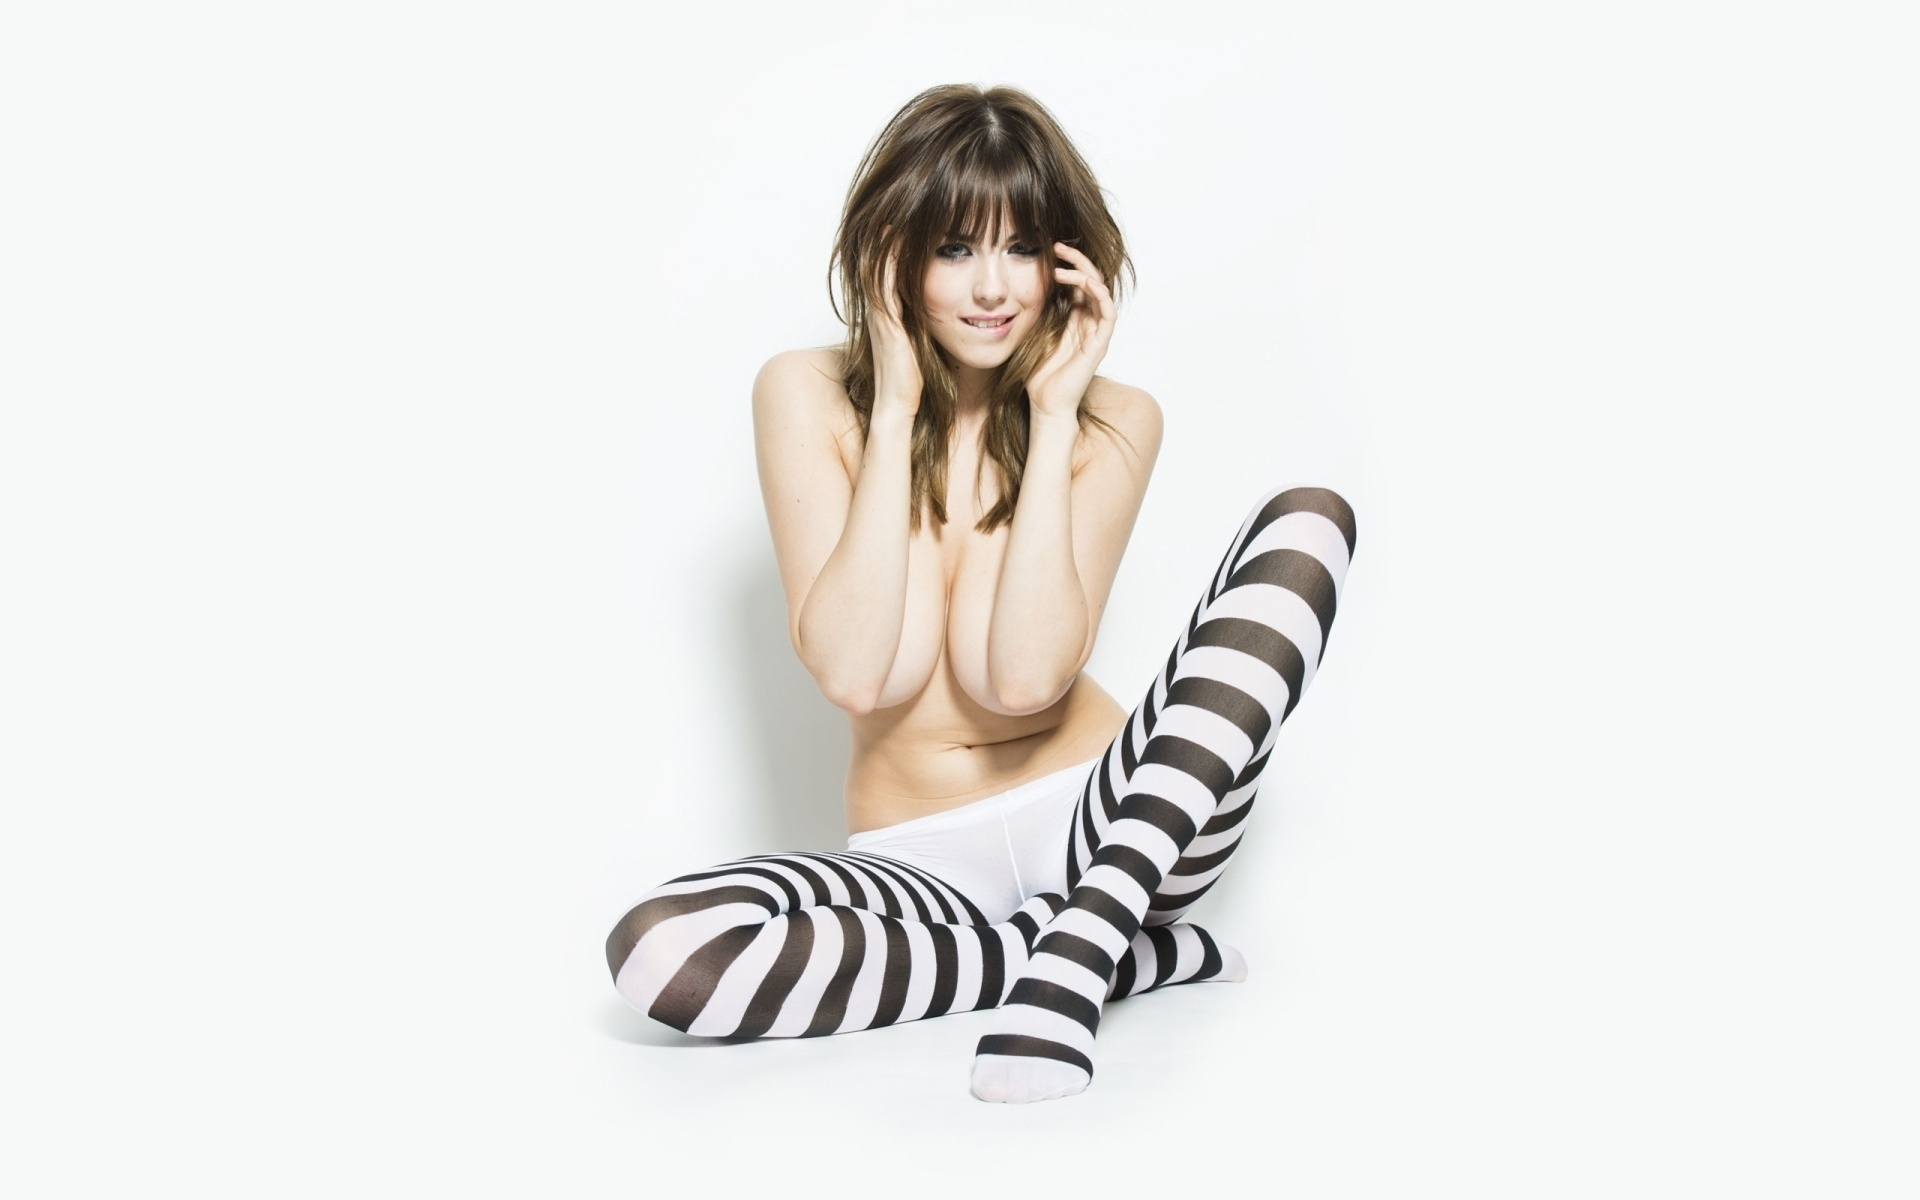 Danielle Sharp Background